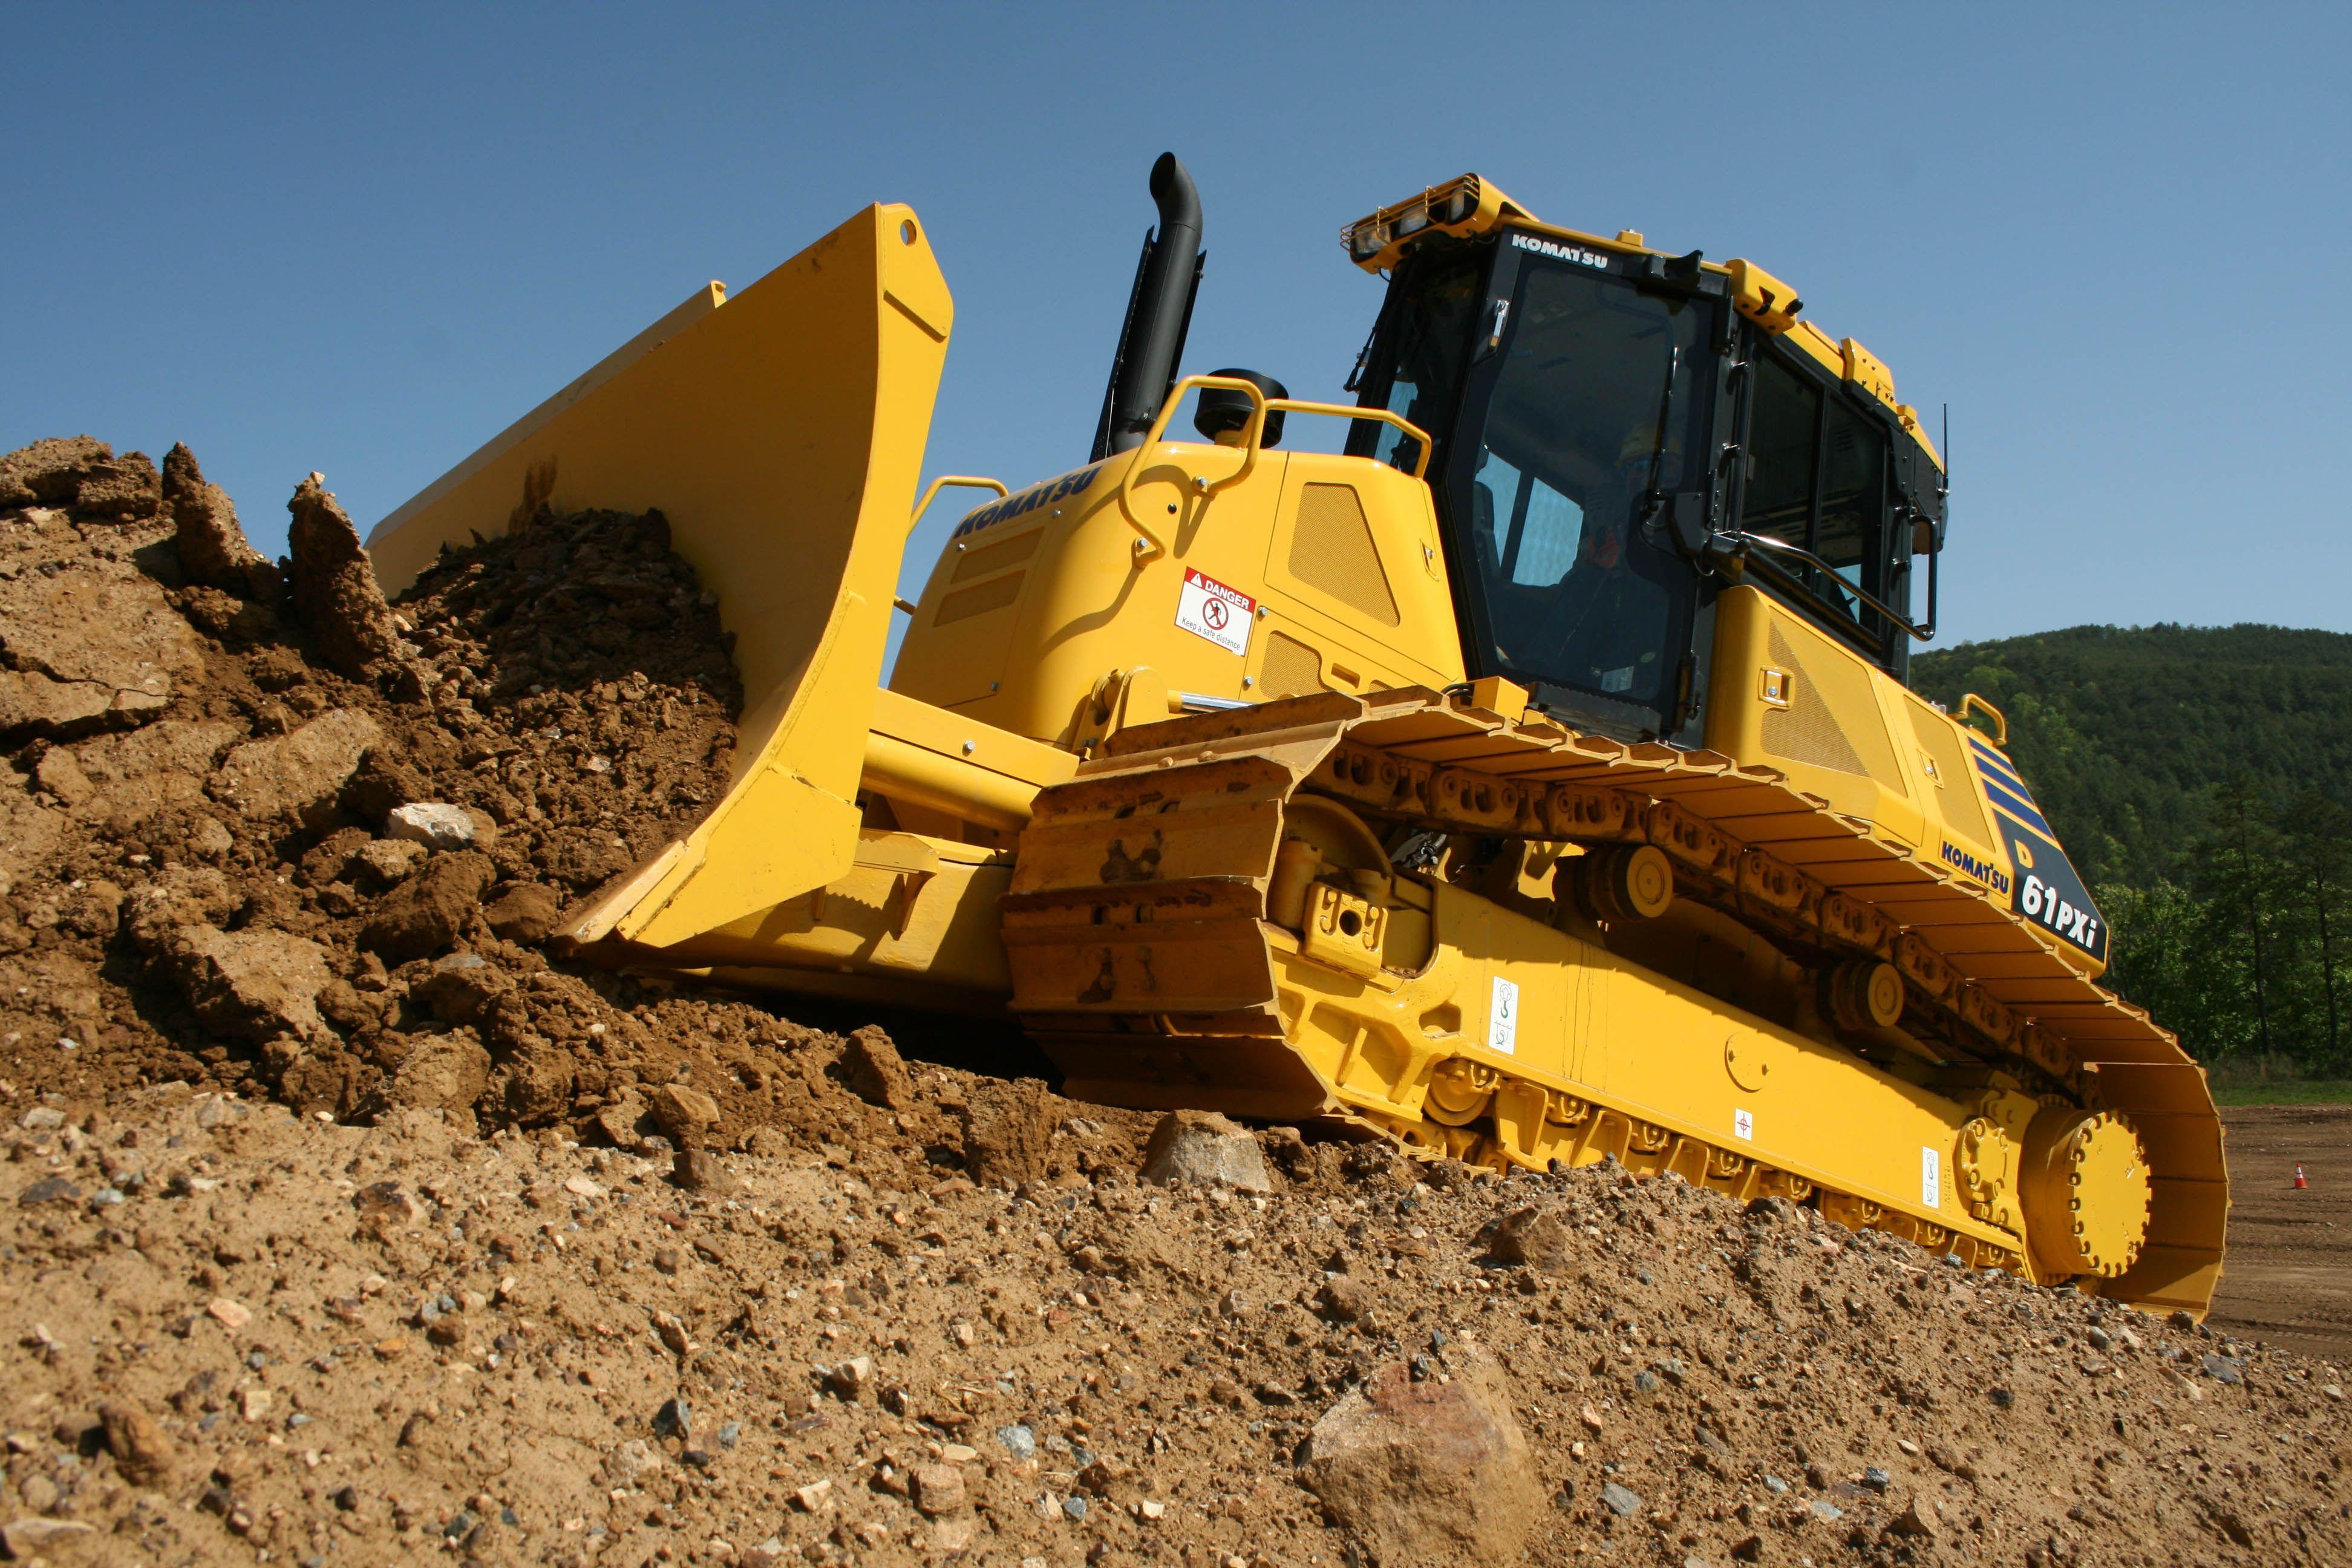 Komatsu D61PXi-23 bulldozer   shiny tractors   Caterpillar ... on